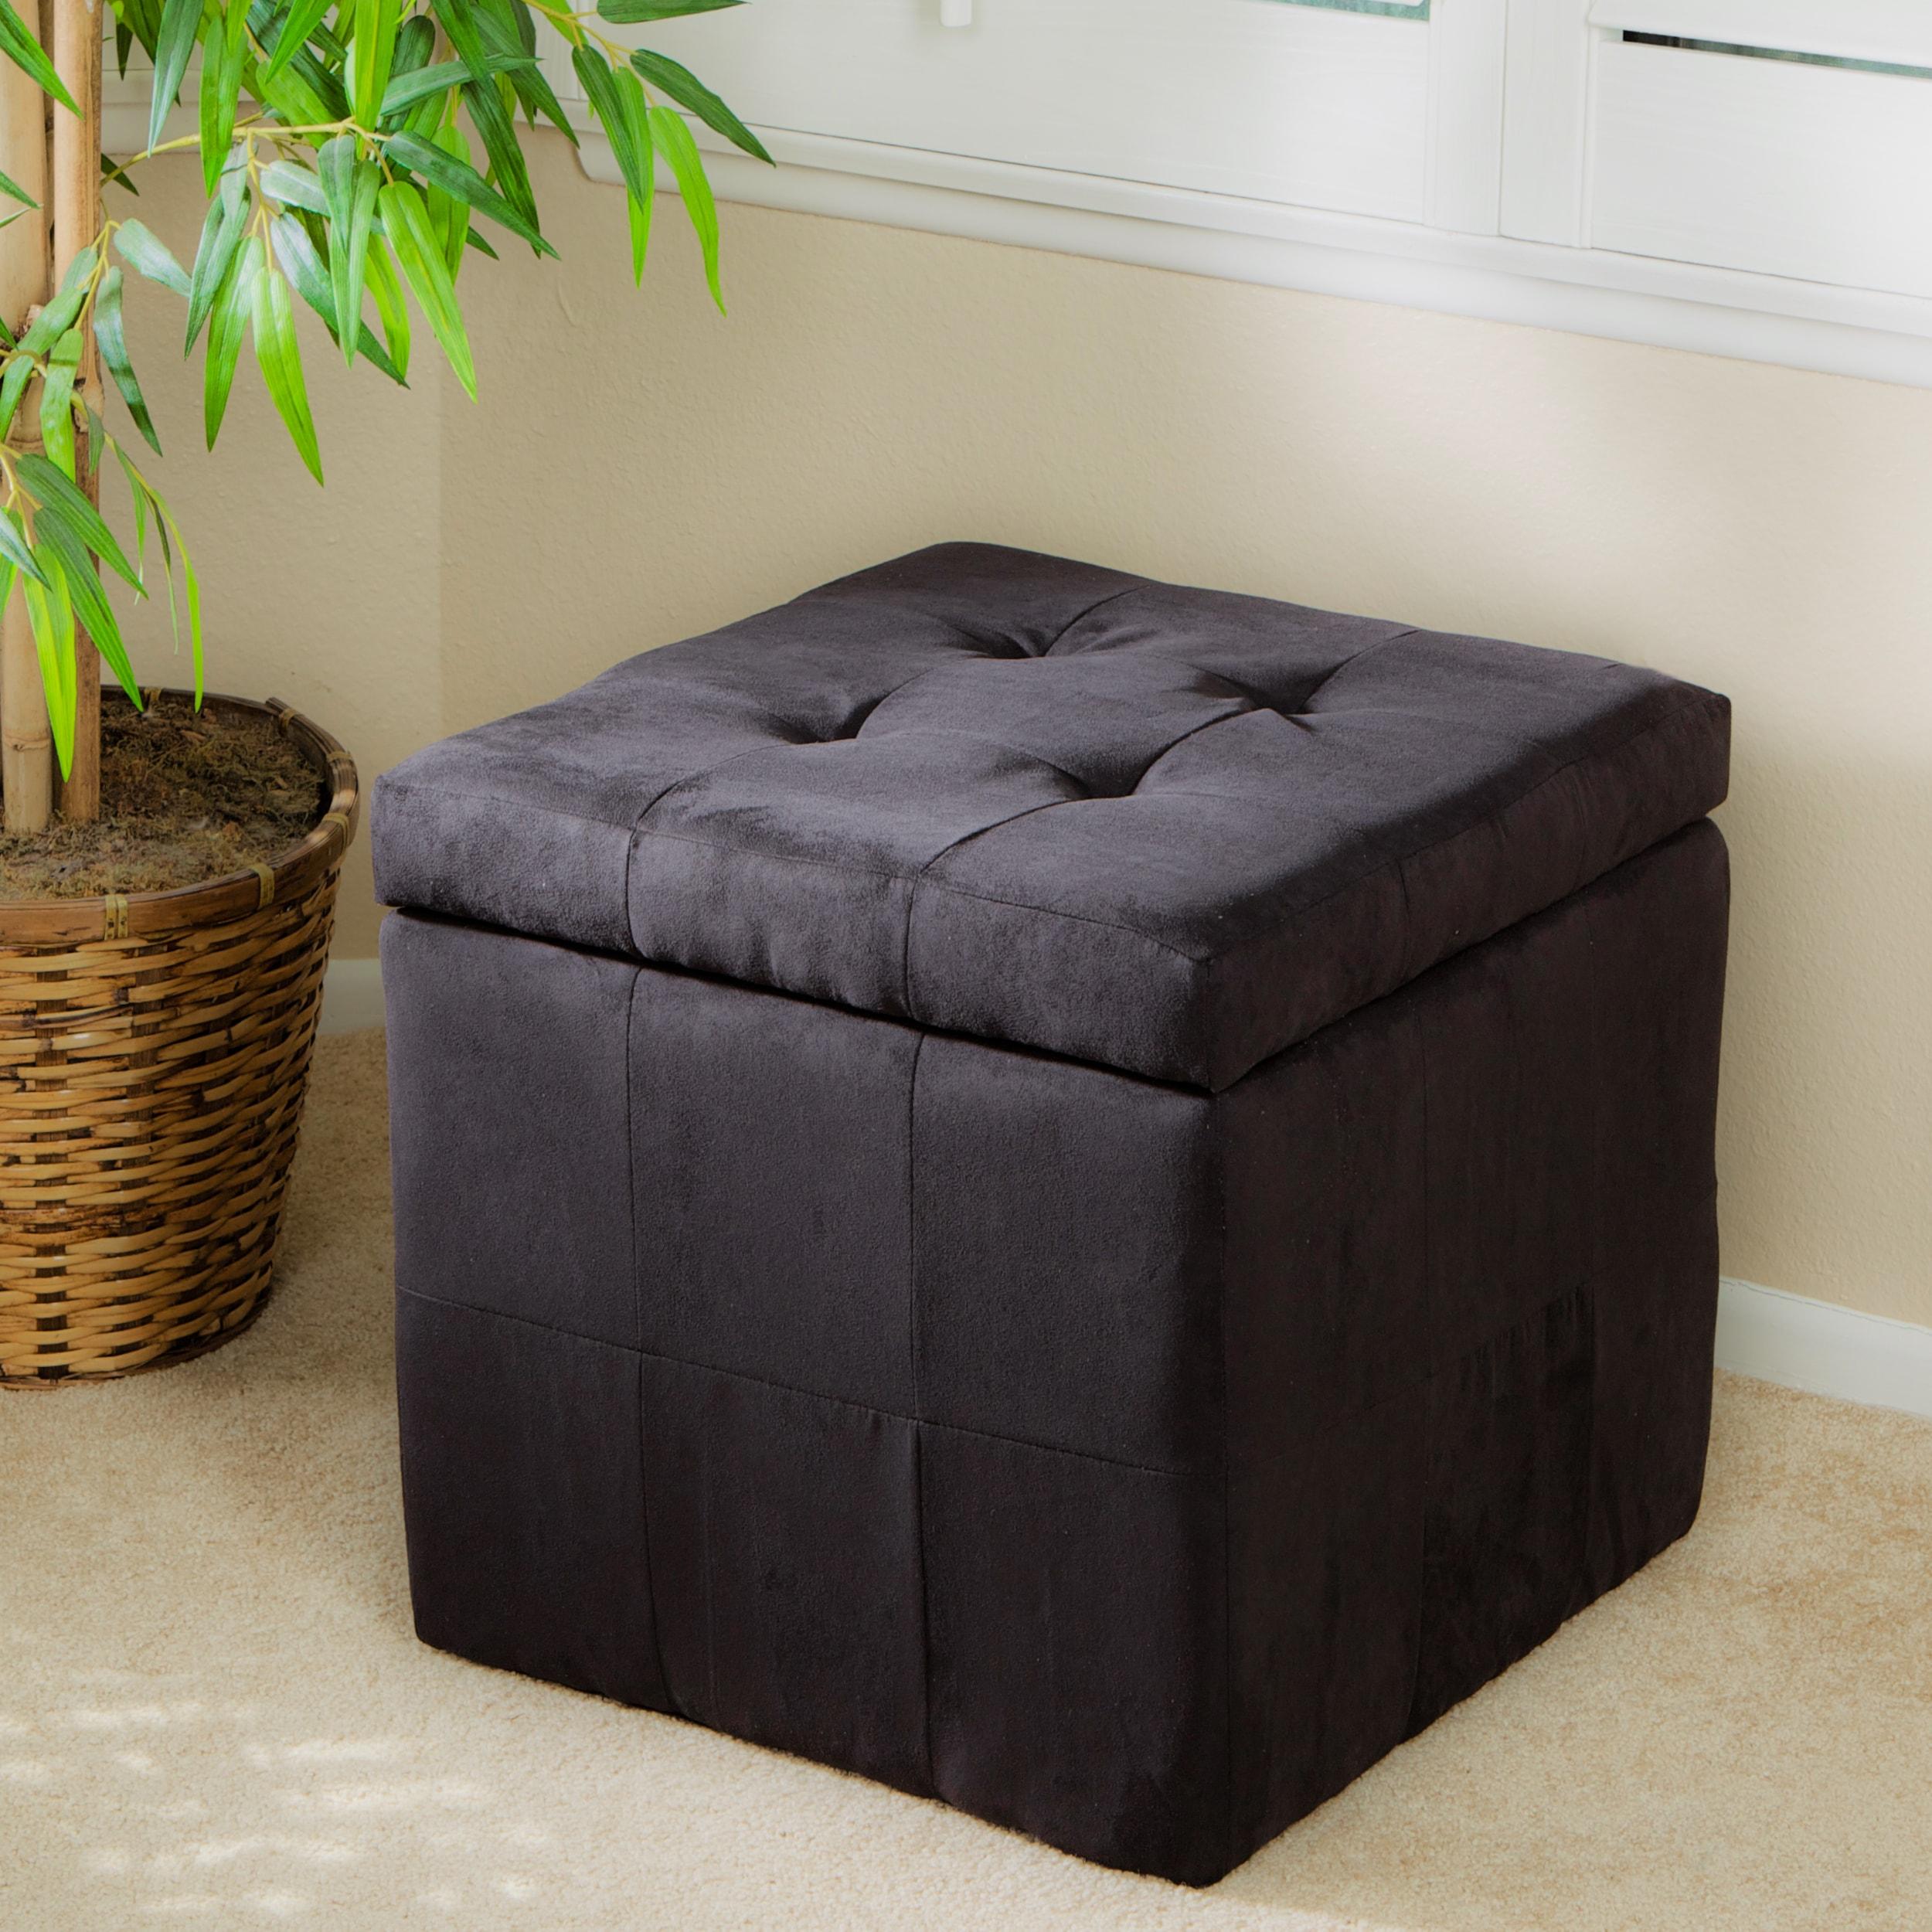 Tufted Black Fabric Storage Cube Ottoman Free Shipping